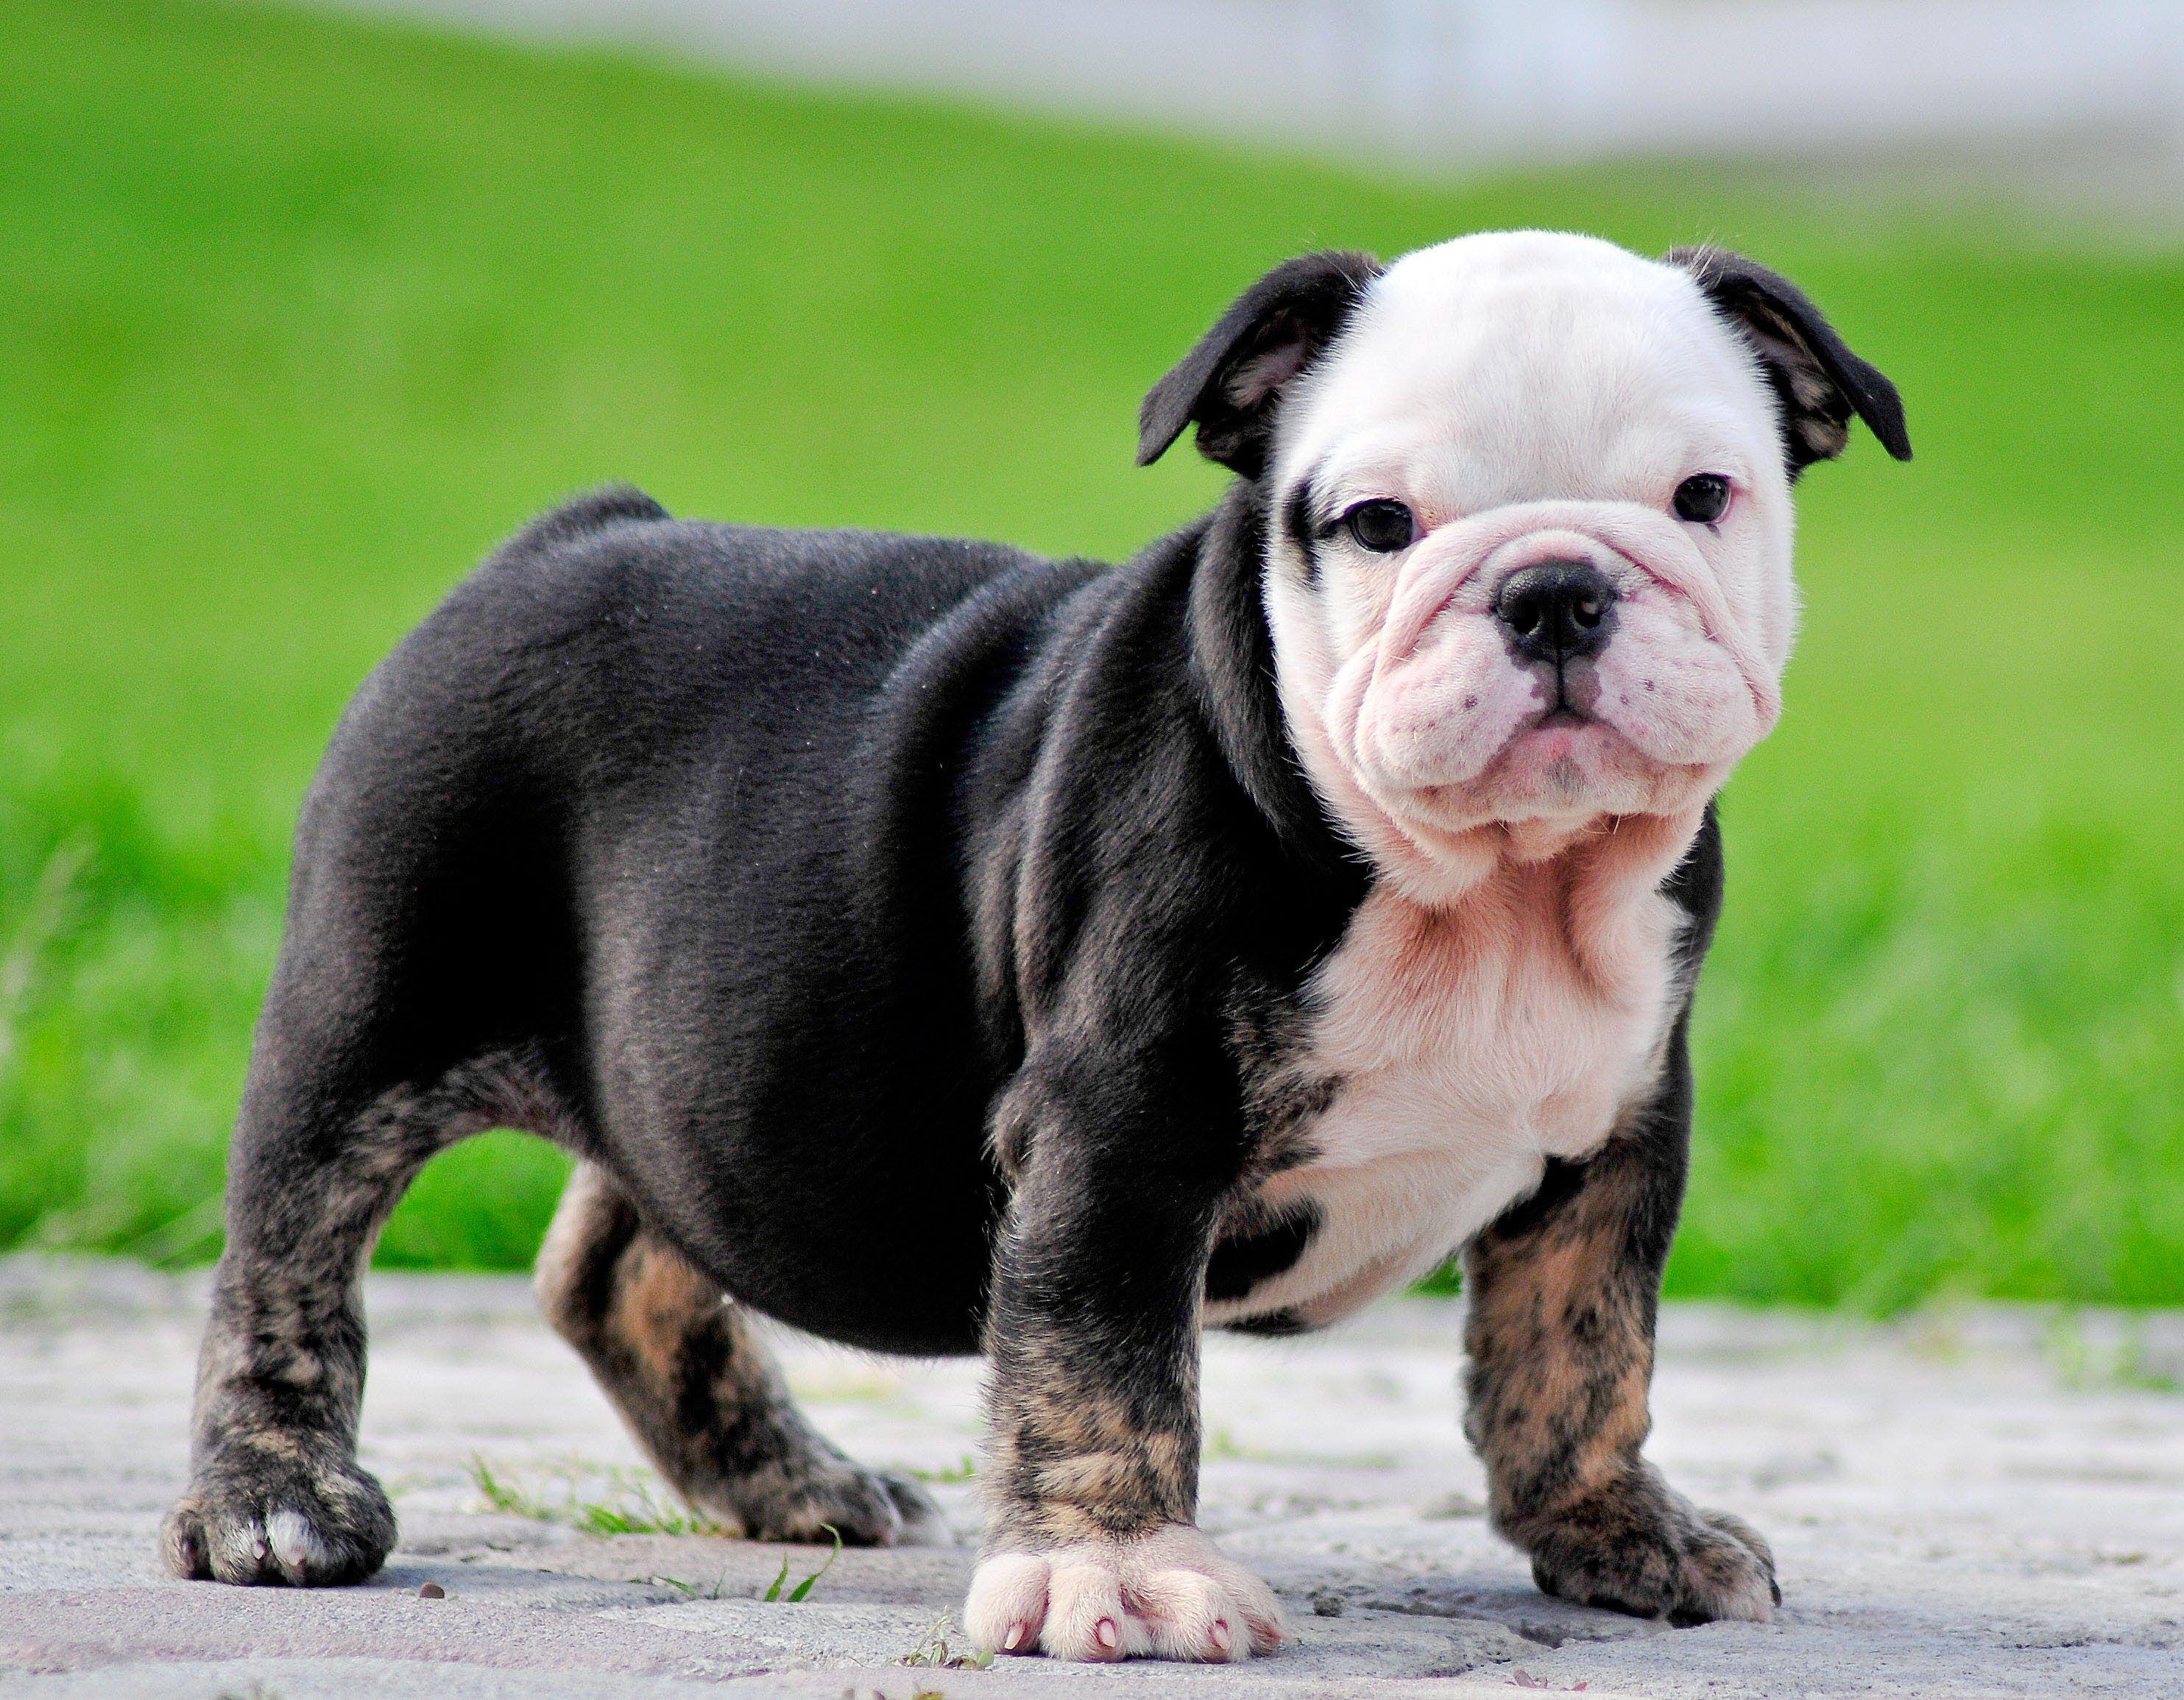 Black And Tan English Bulldog Puppy American Bulldog Puppies Bulldog Puppies Bulldog